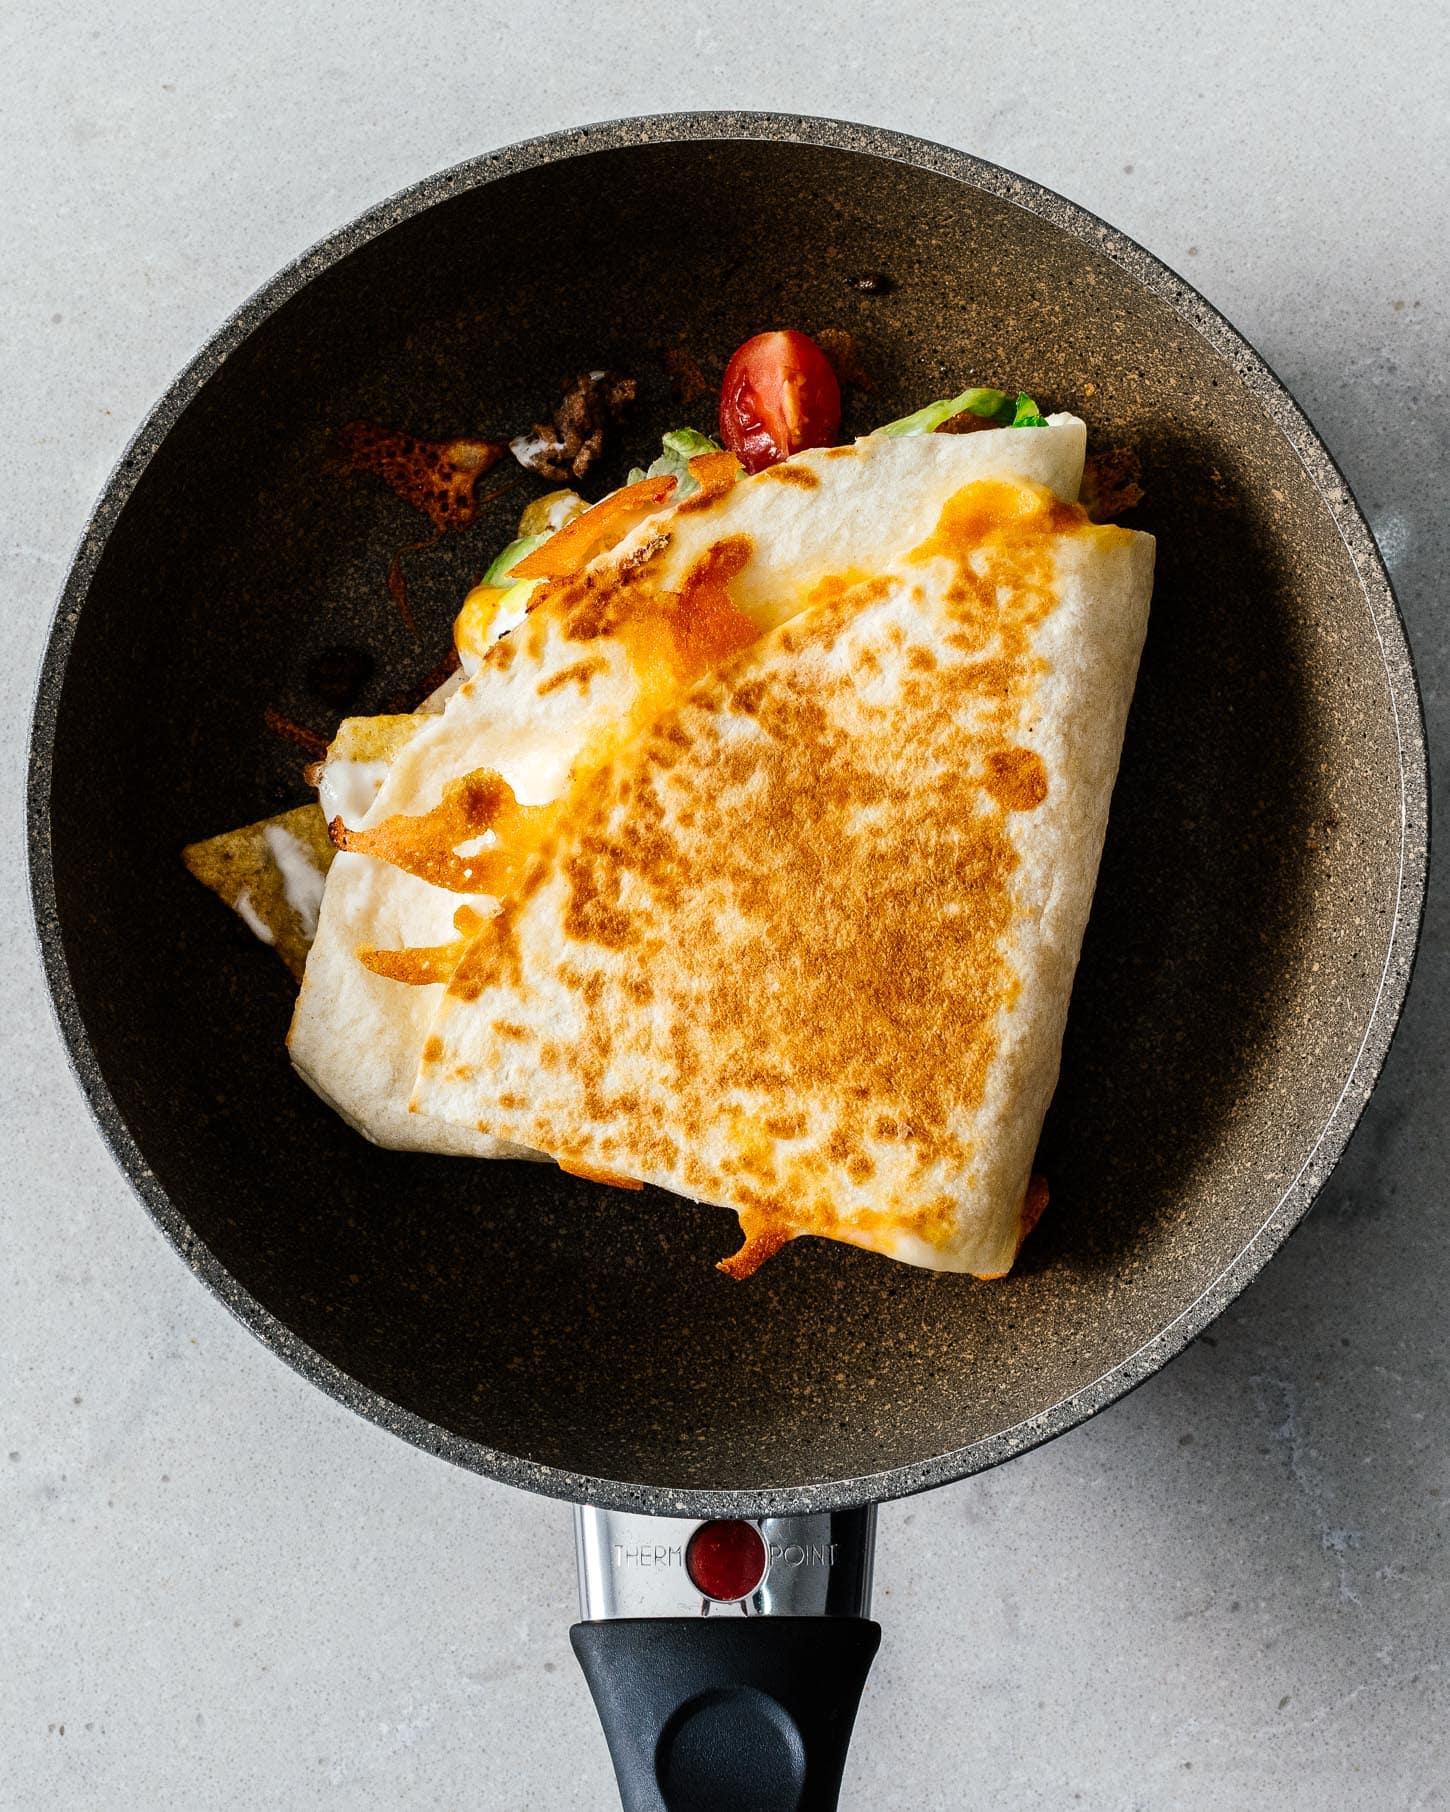 TikTok Wrap recept (tortilla wrap hack) | Eef Kookt Zo  |Tiktok Wraps